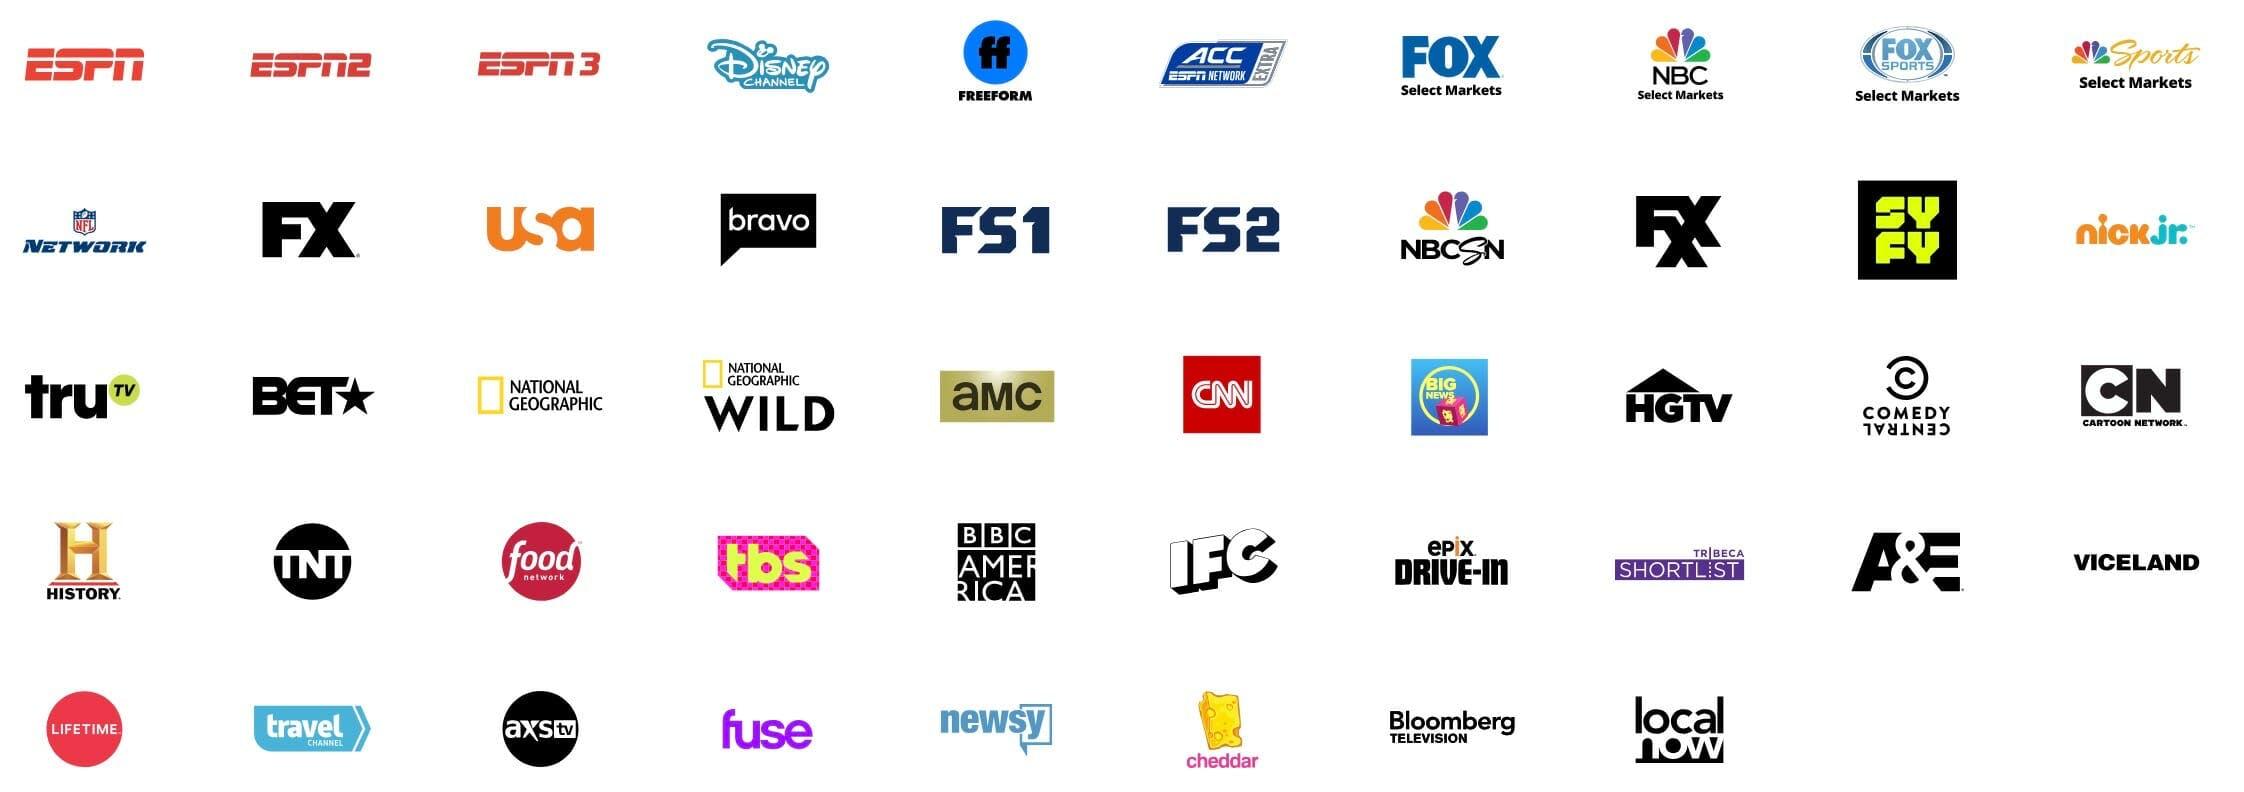 stream nfl games today on tv week 14 - sling orange + blue